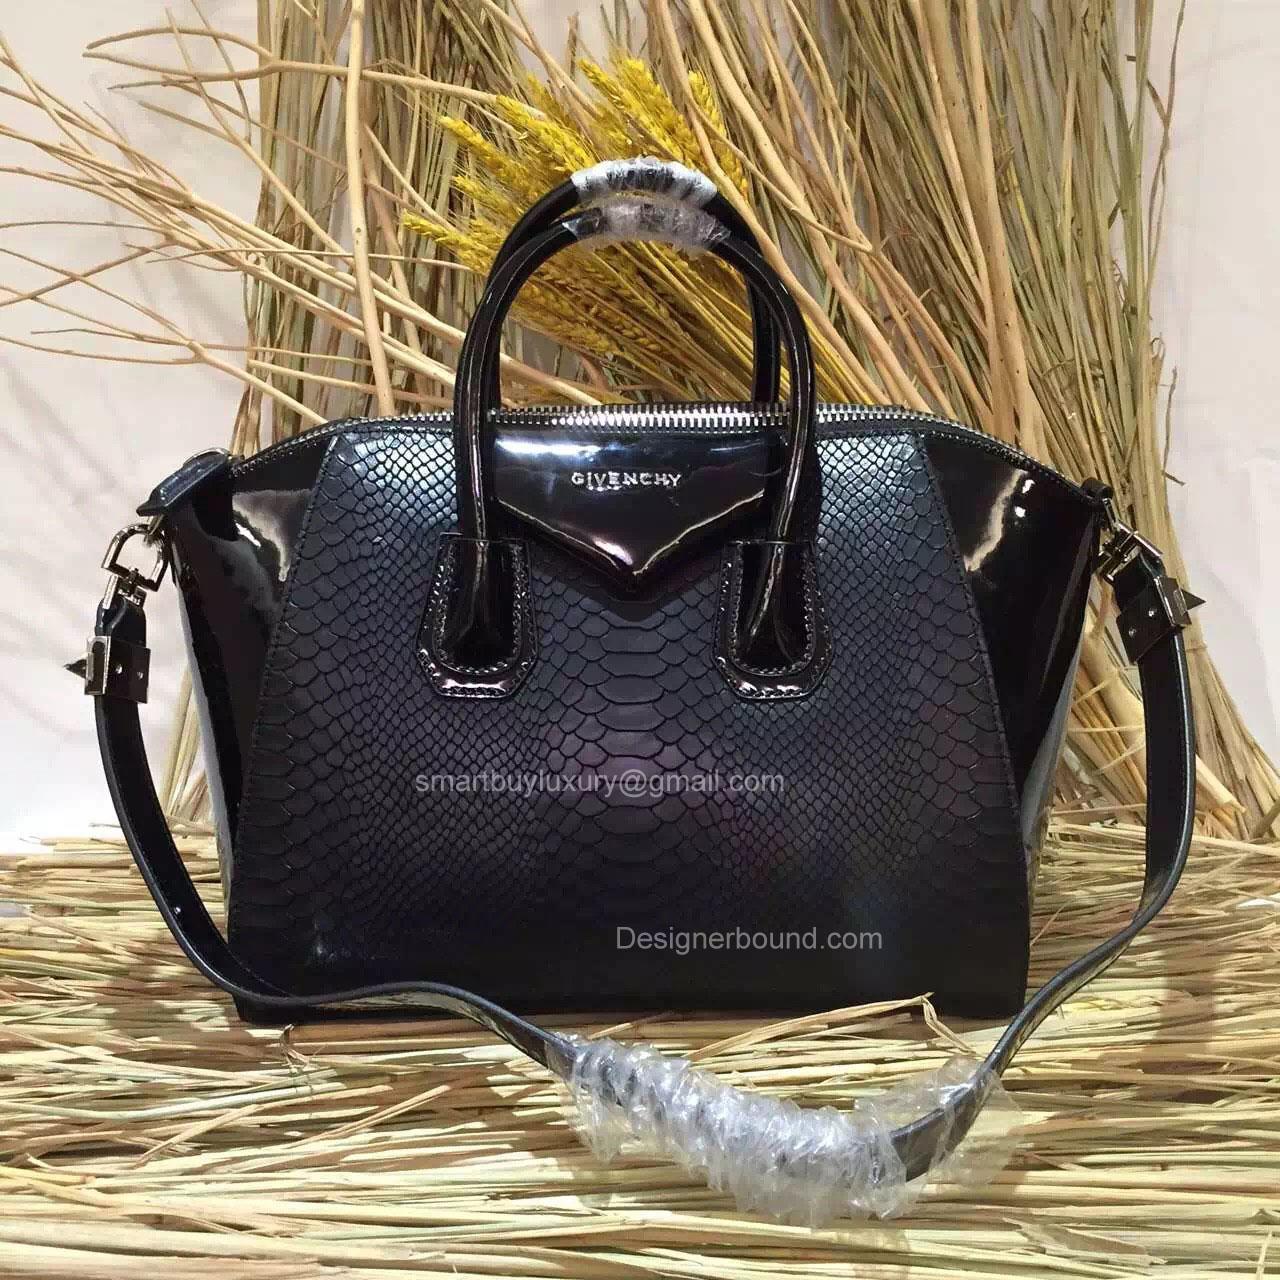 b322bea5fa26 Givenchy Medium Antigona Bag in Black Python and Patent Leather 285173L